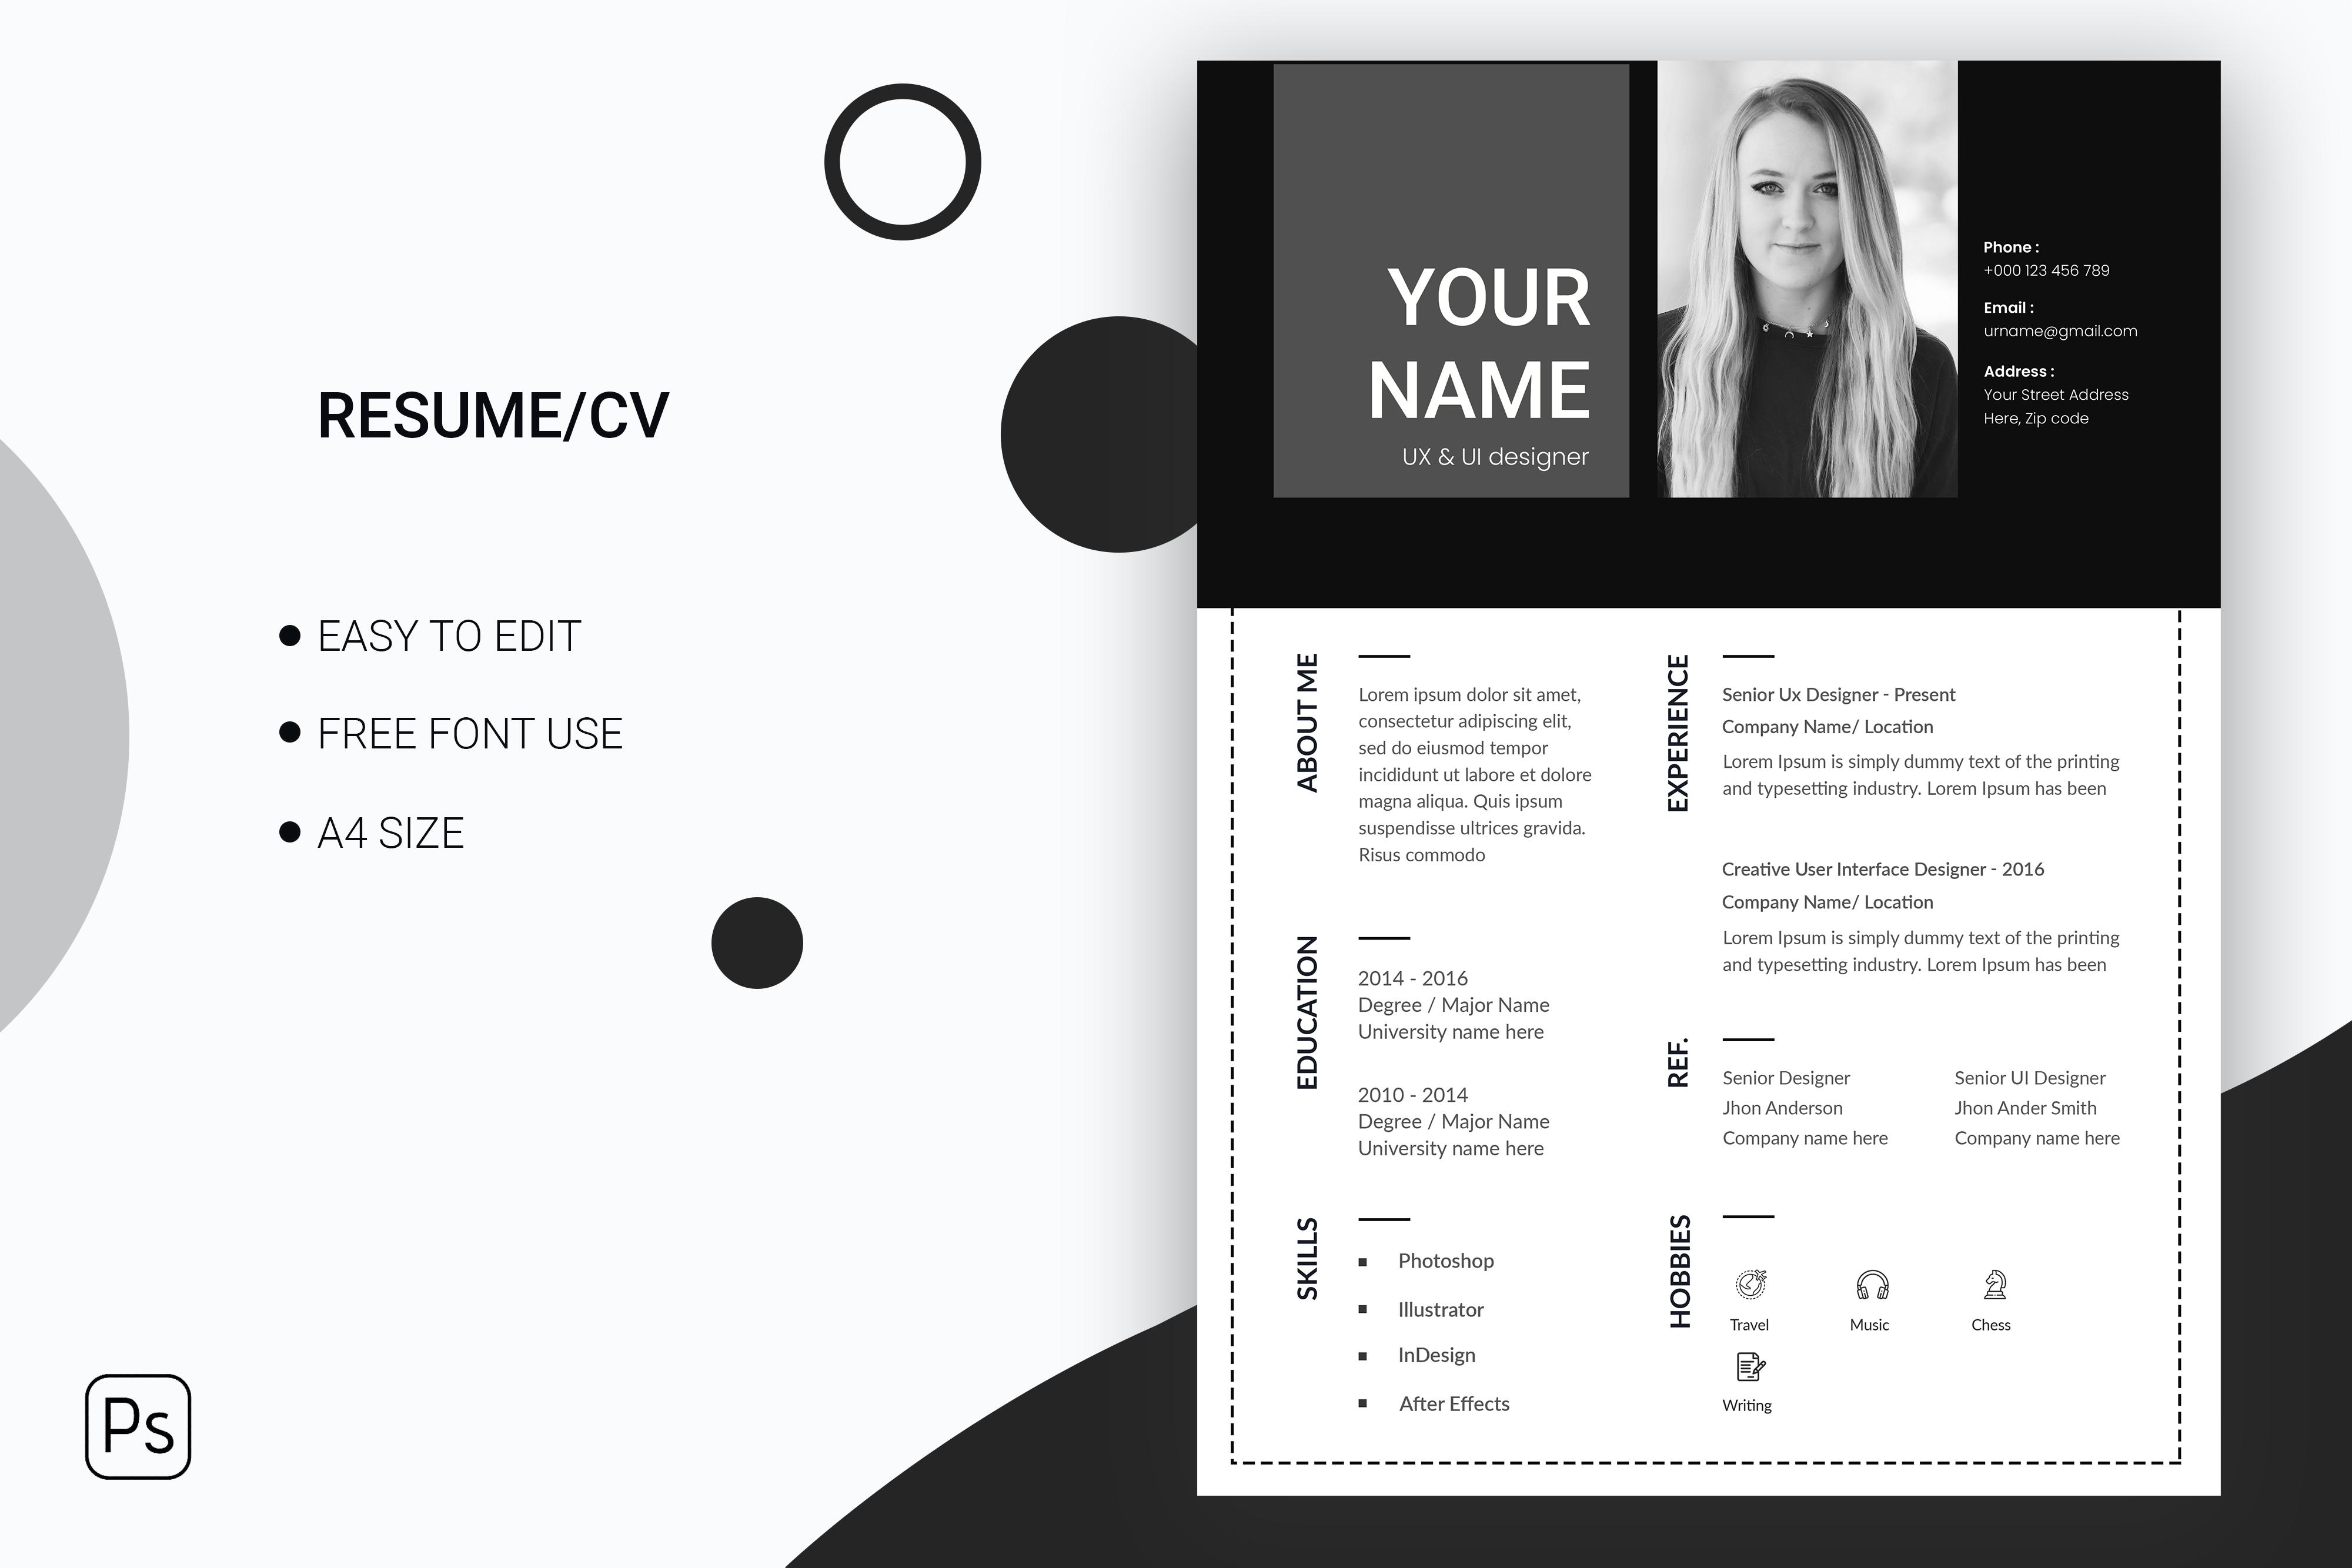 Clean & minimal resume or cv design template